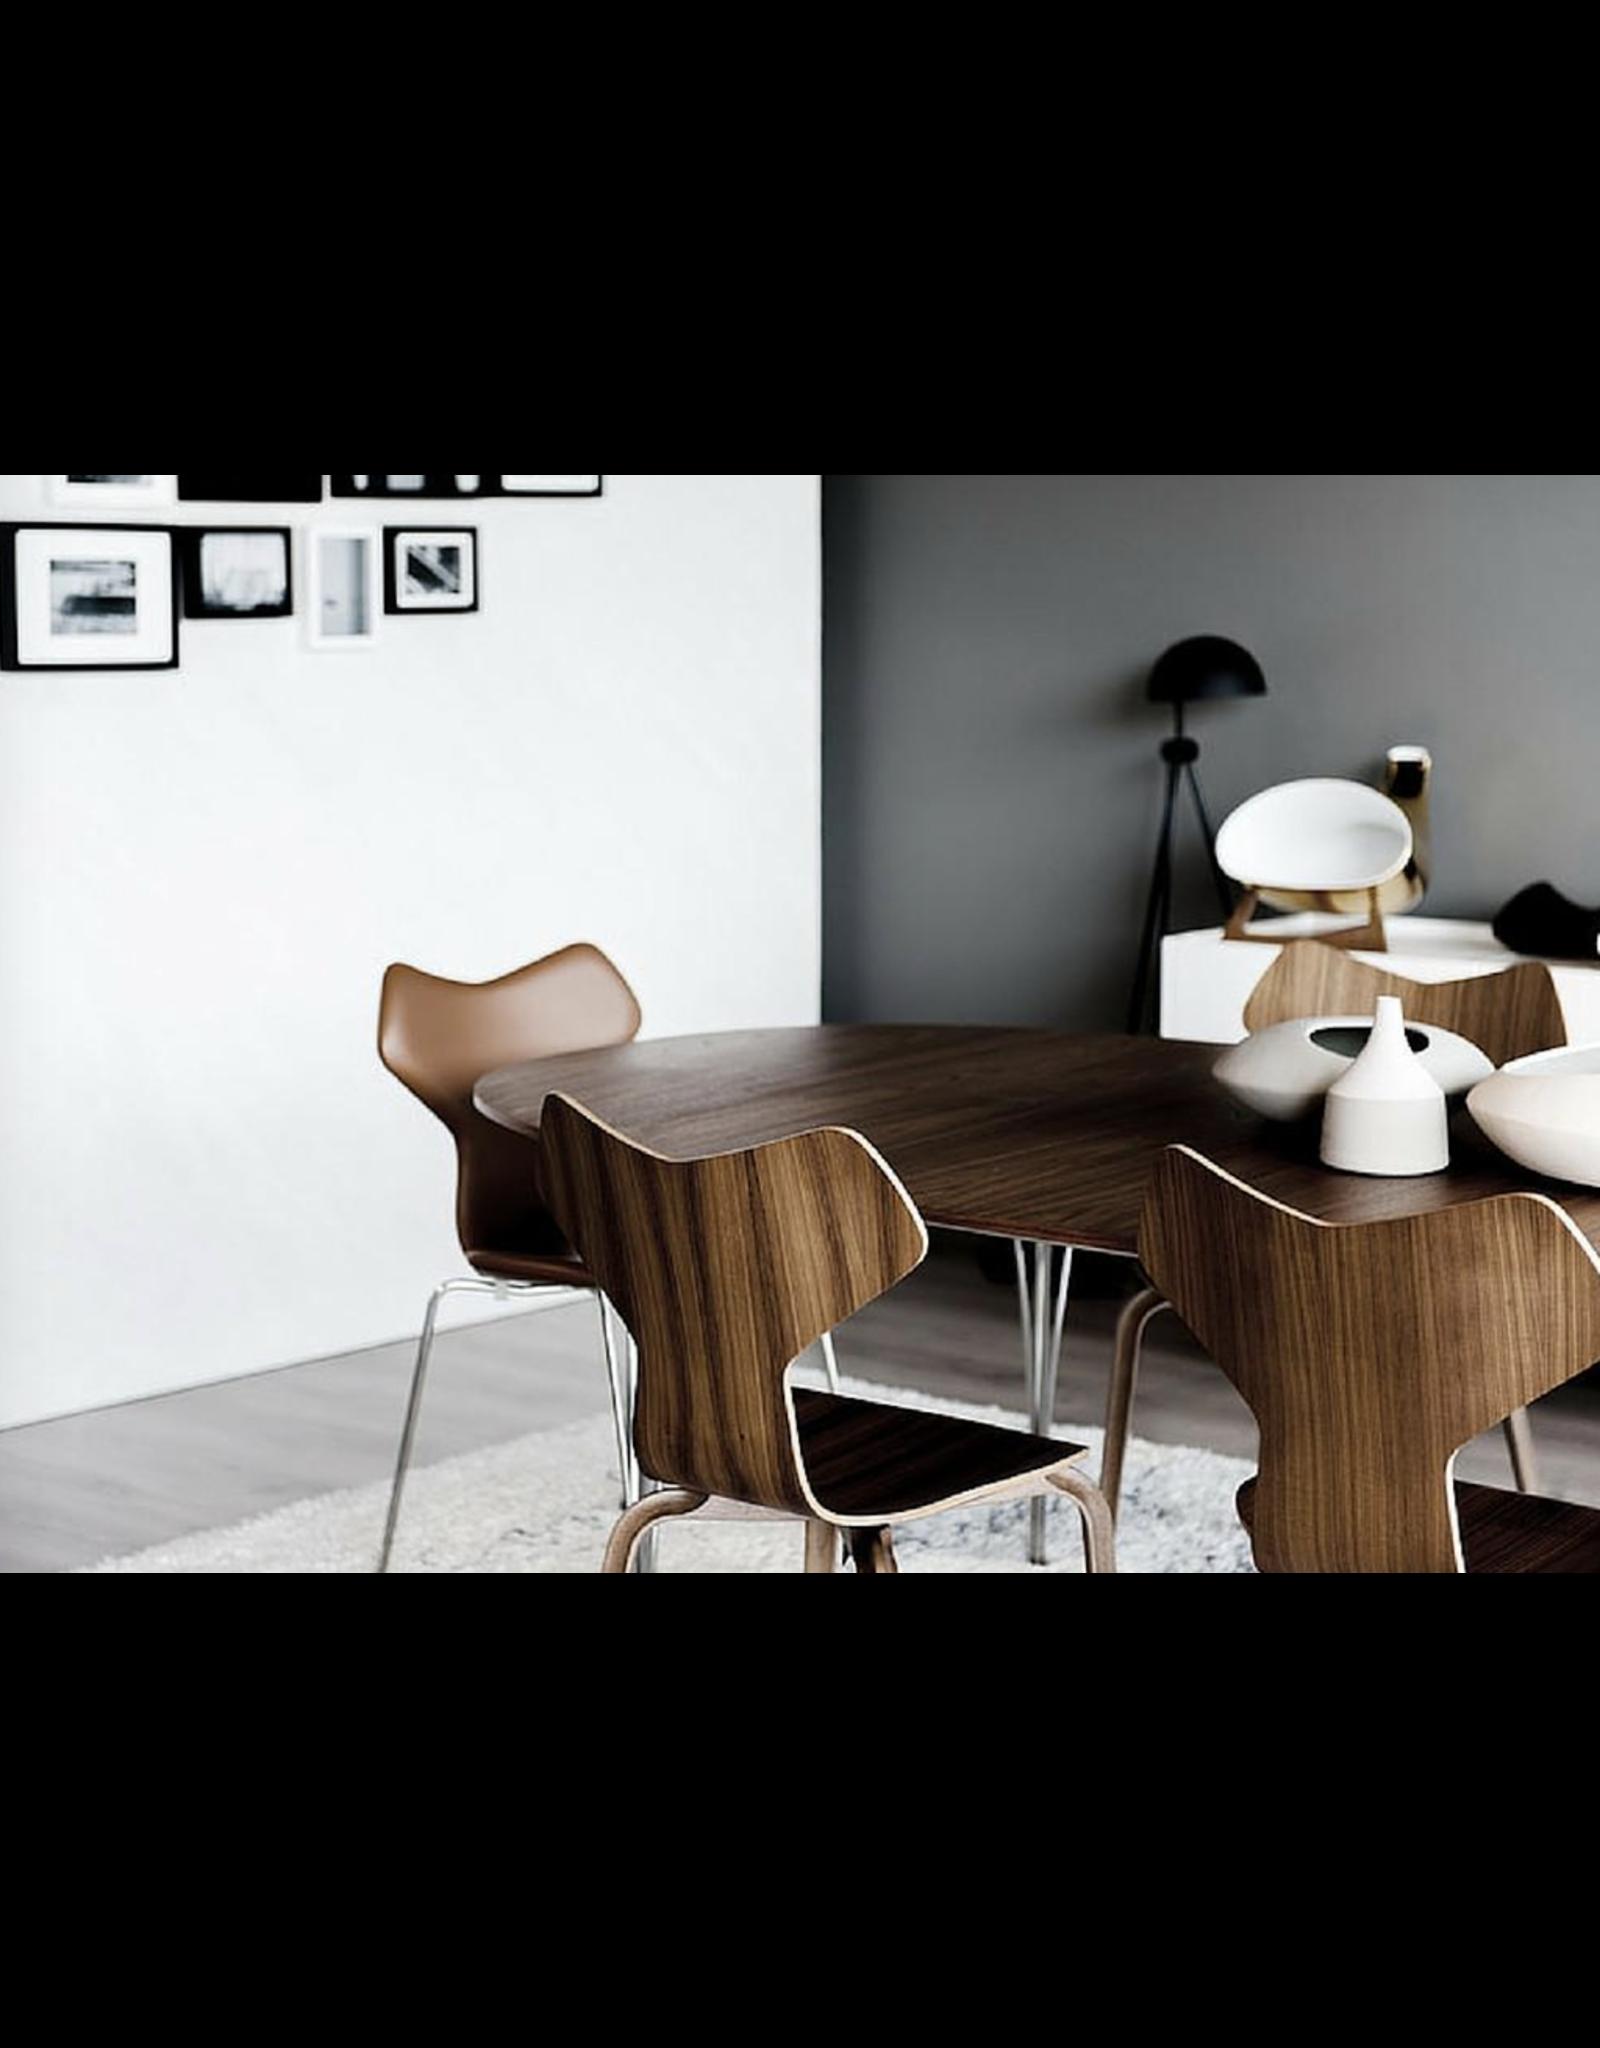 B614 SUPER-ELLIPTICAL TABLE IN WALNUT